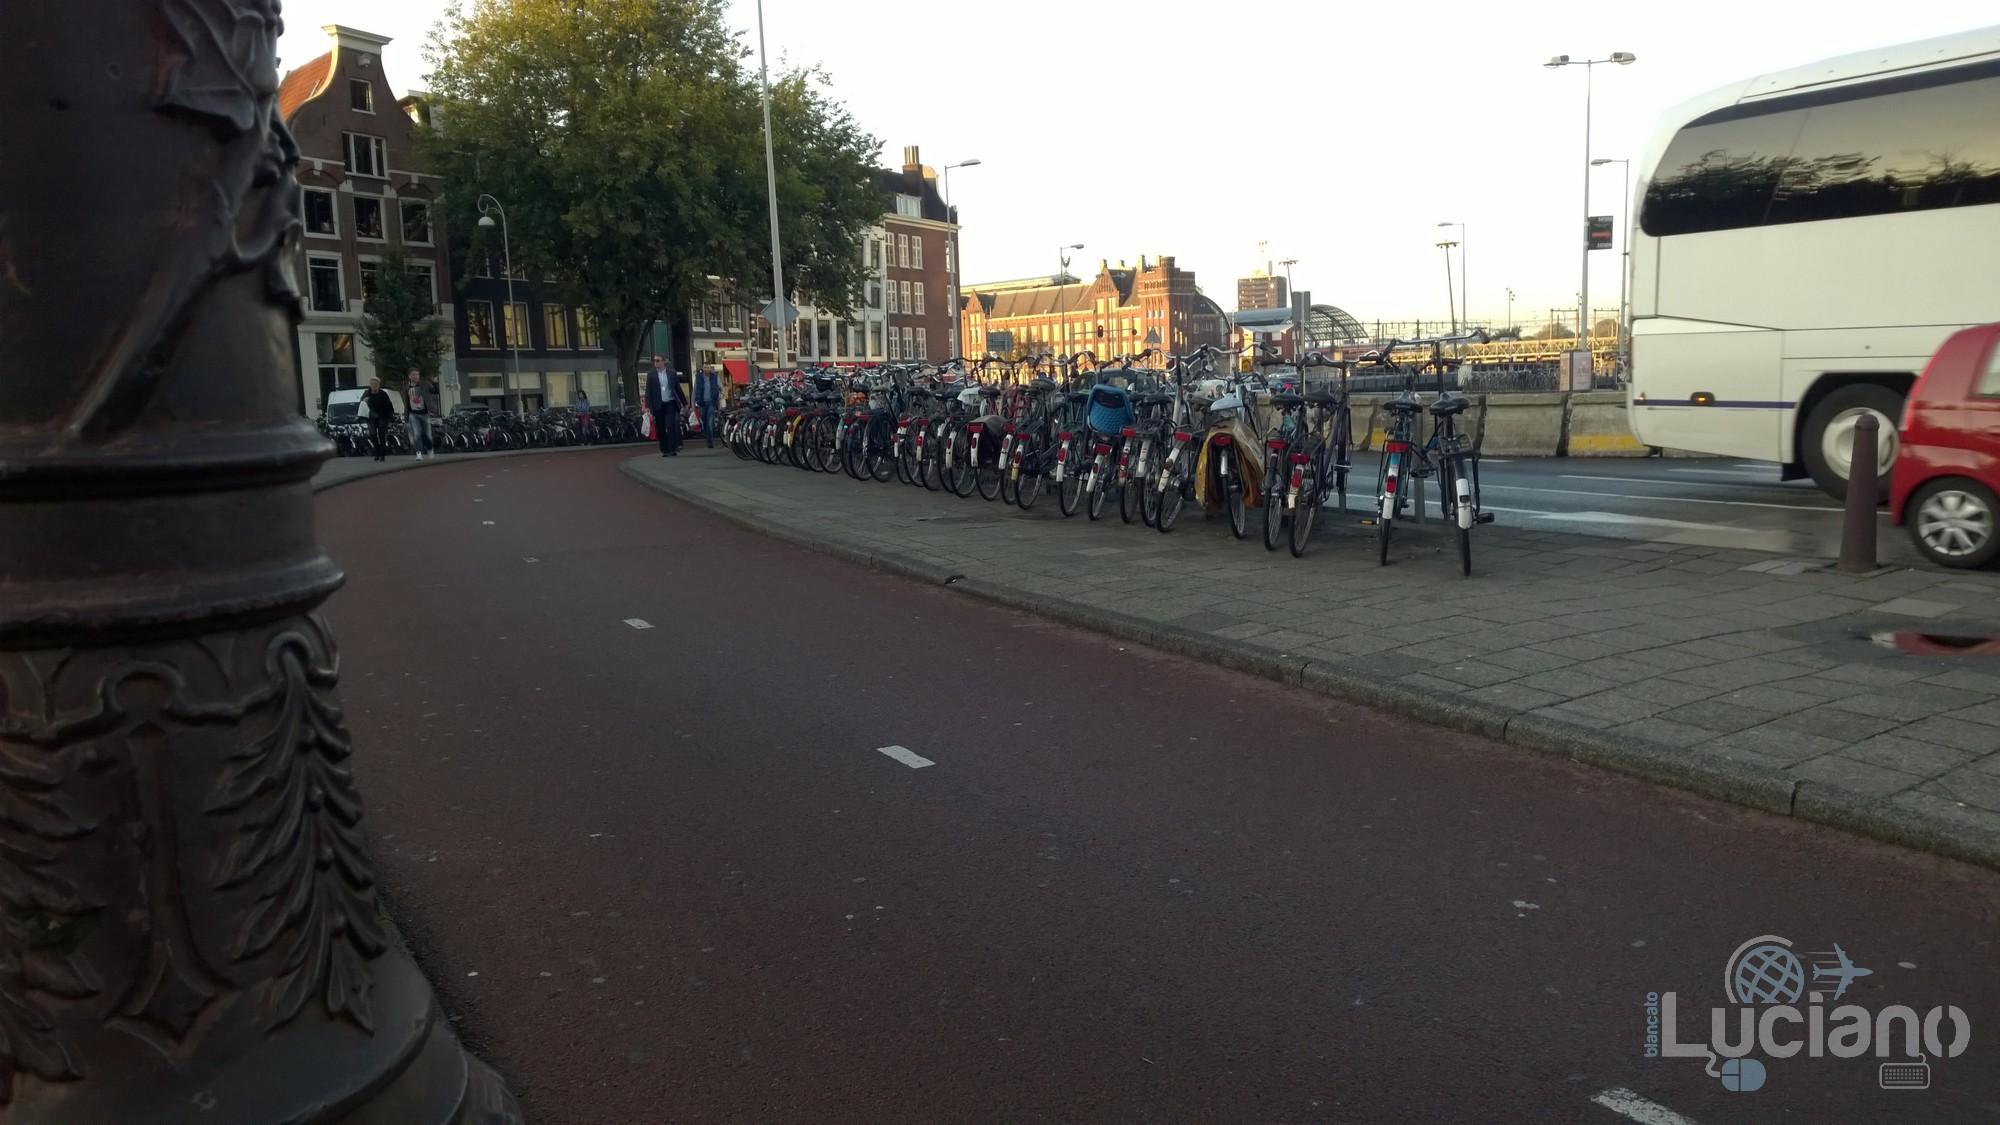 amsterdam-2014-vueling-lucianoblancatoit (214)